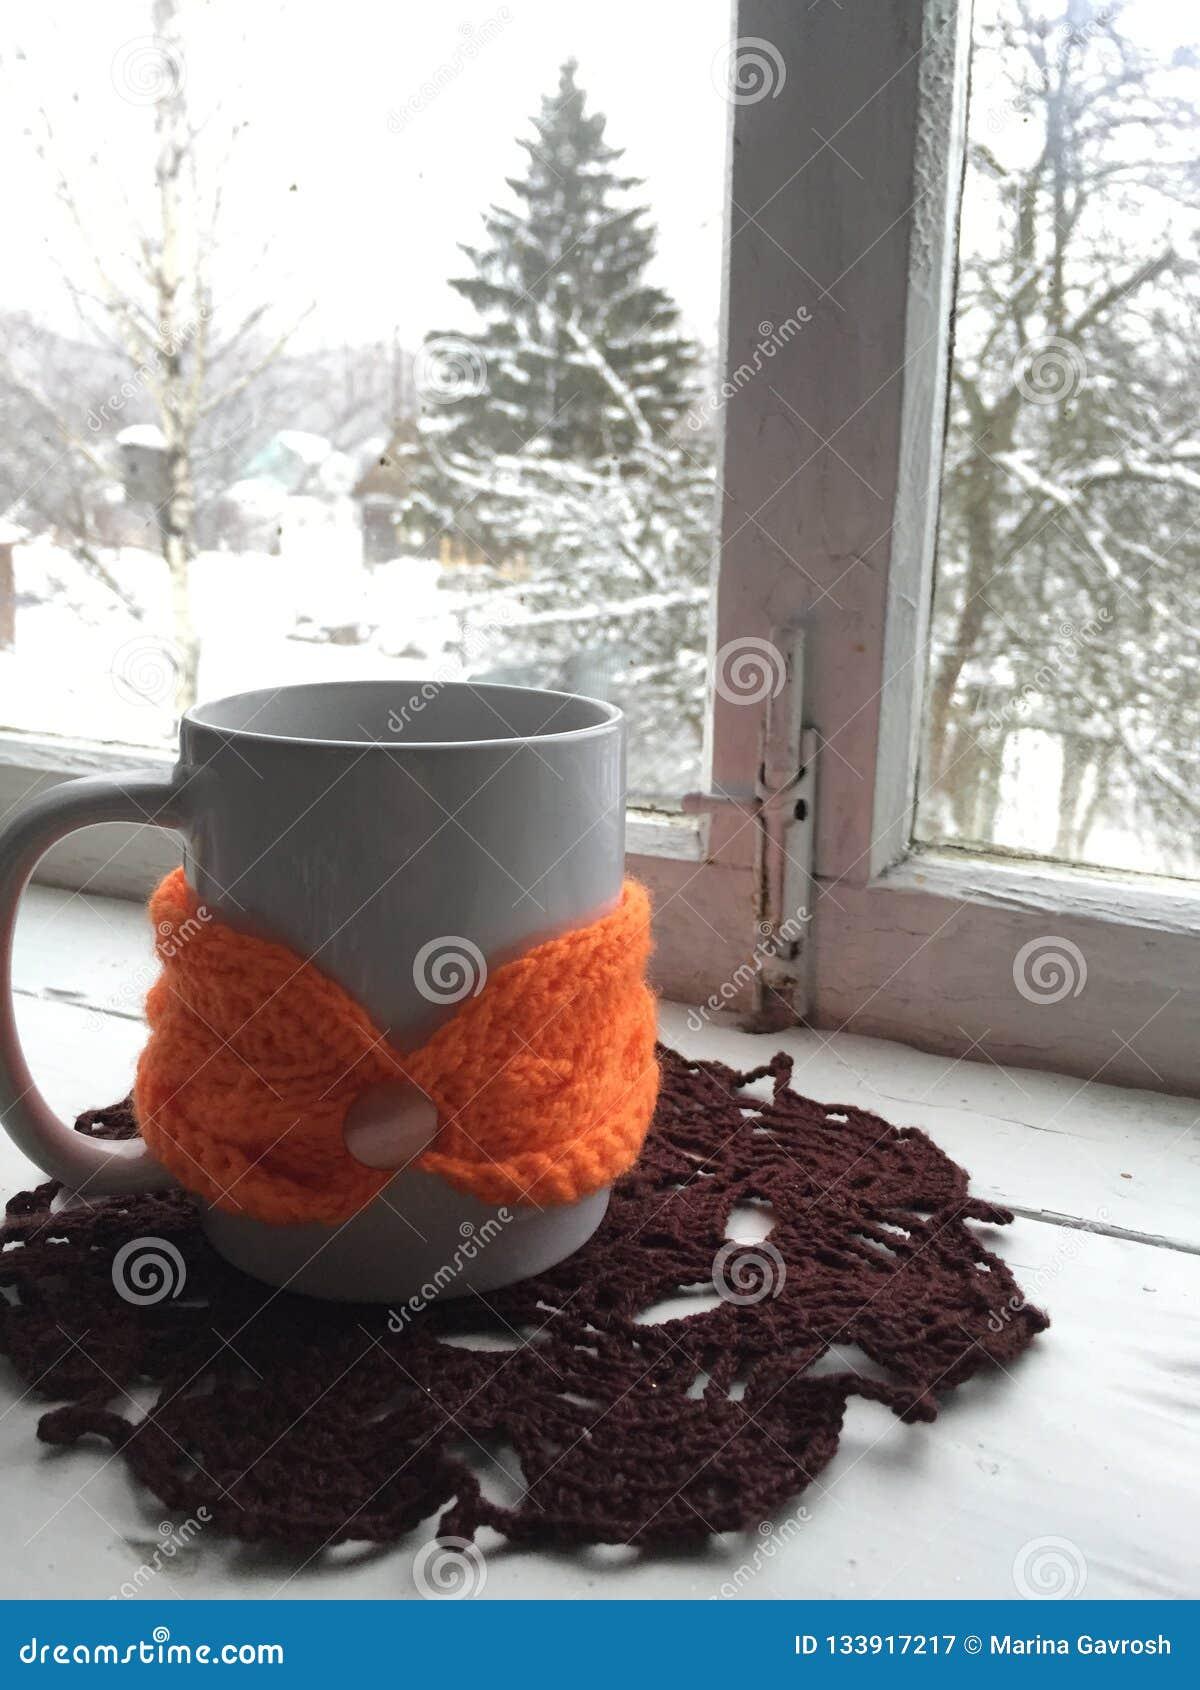 Winter cosiness: white ceramic mug of tea or coffee